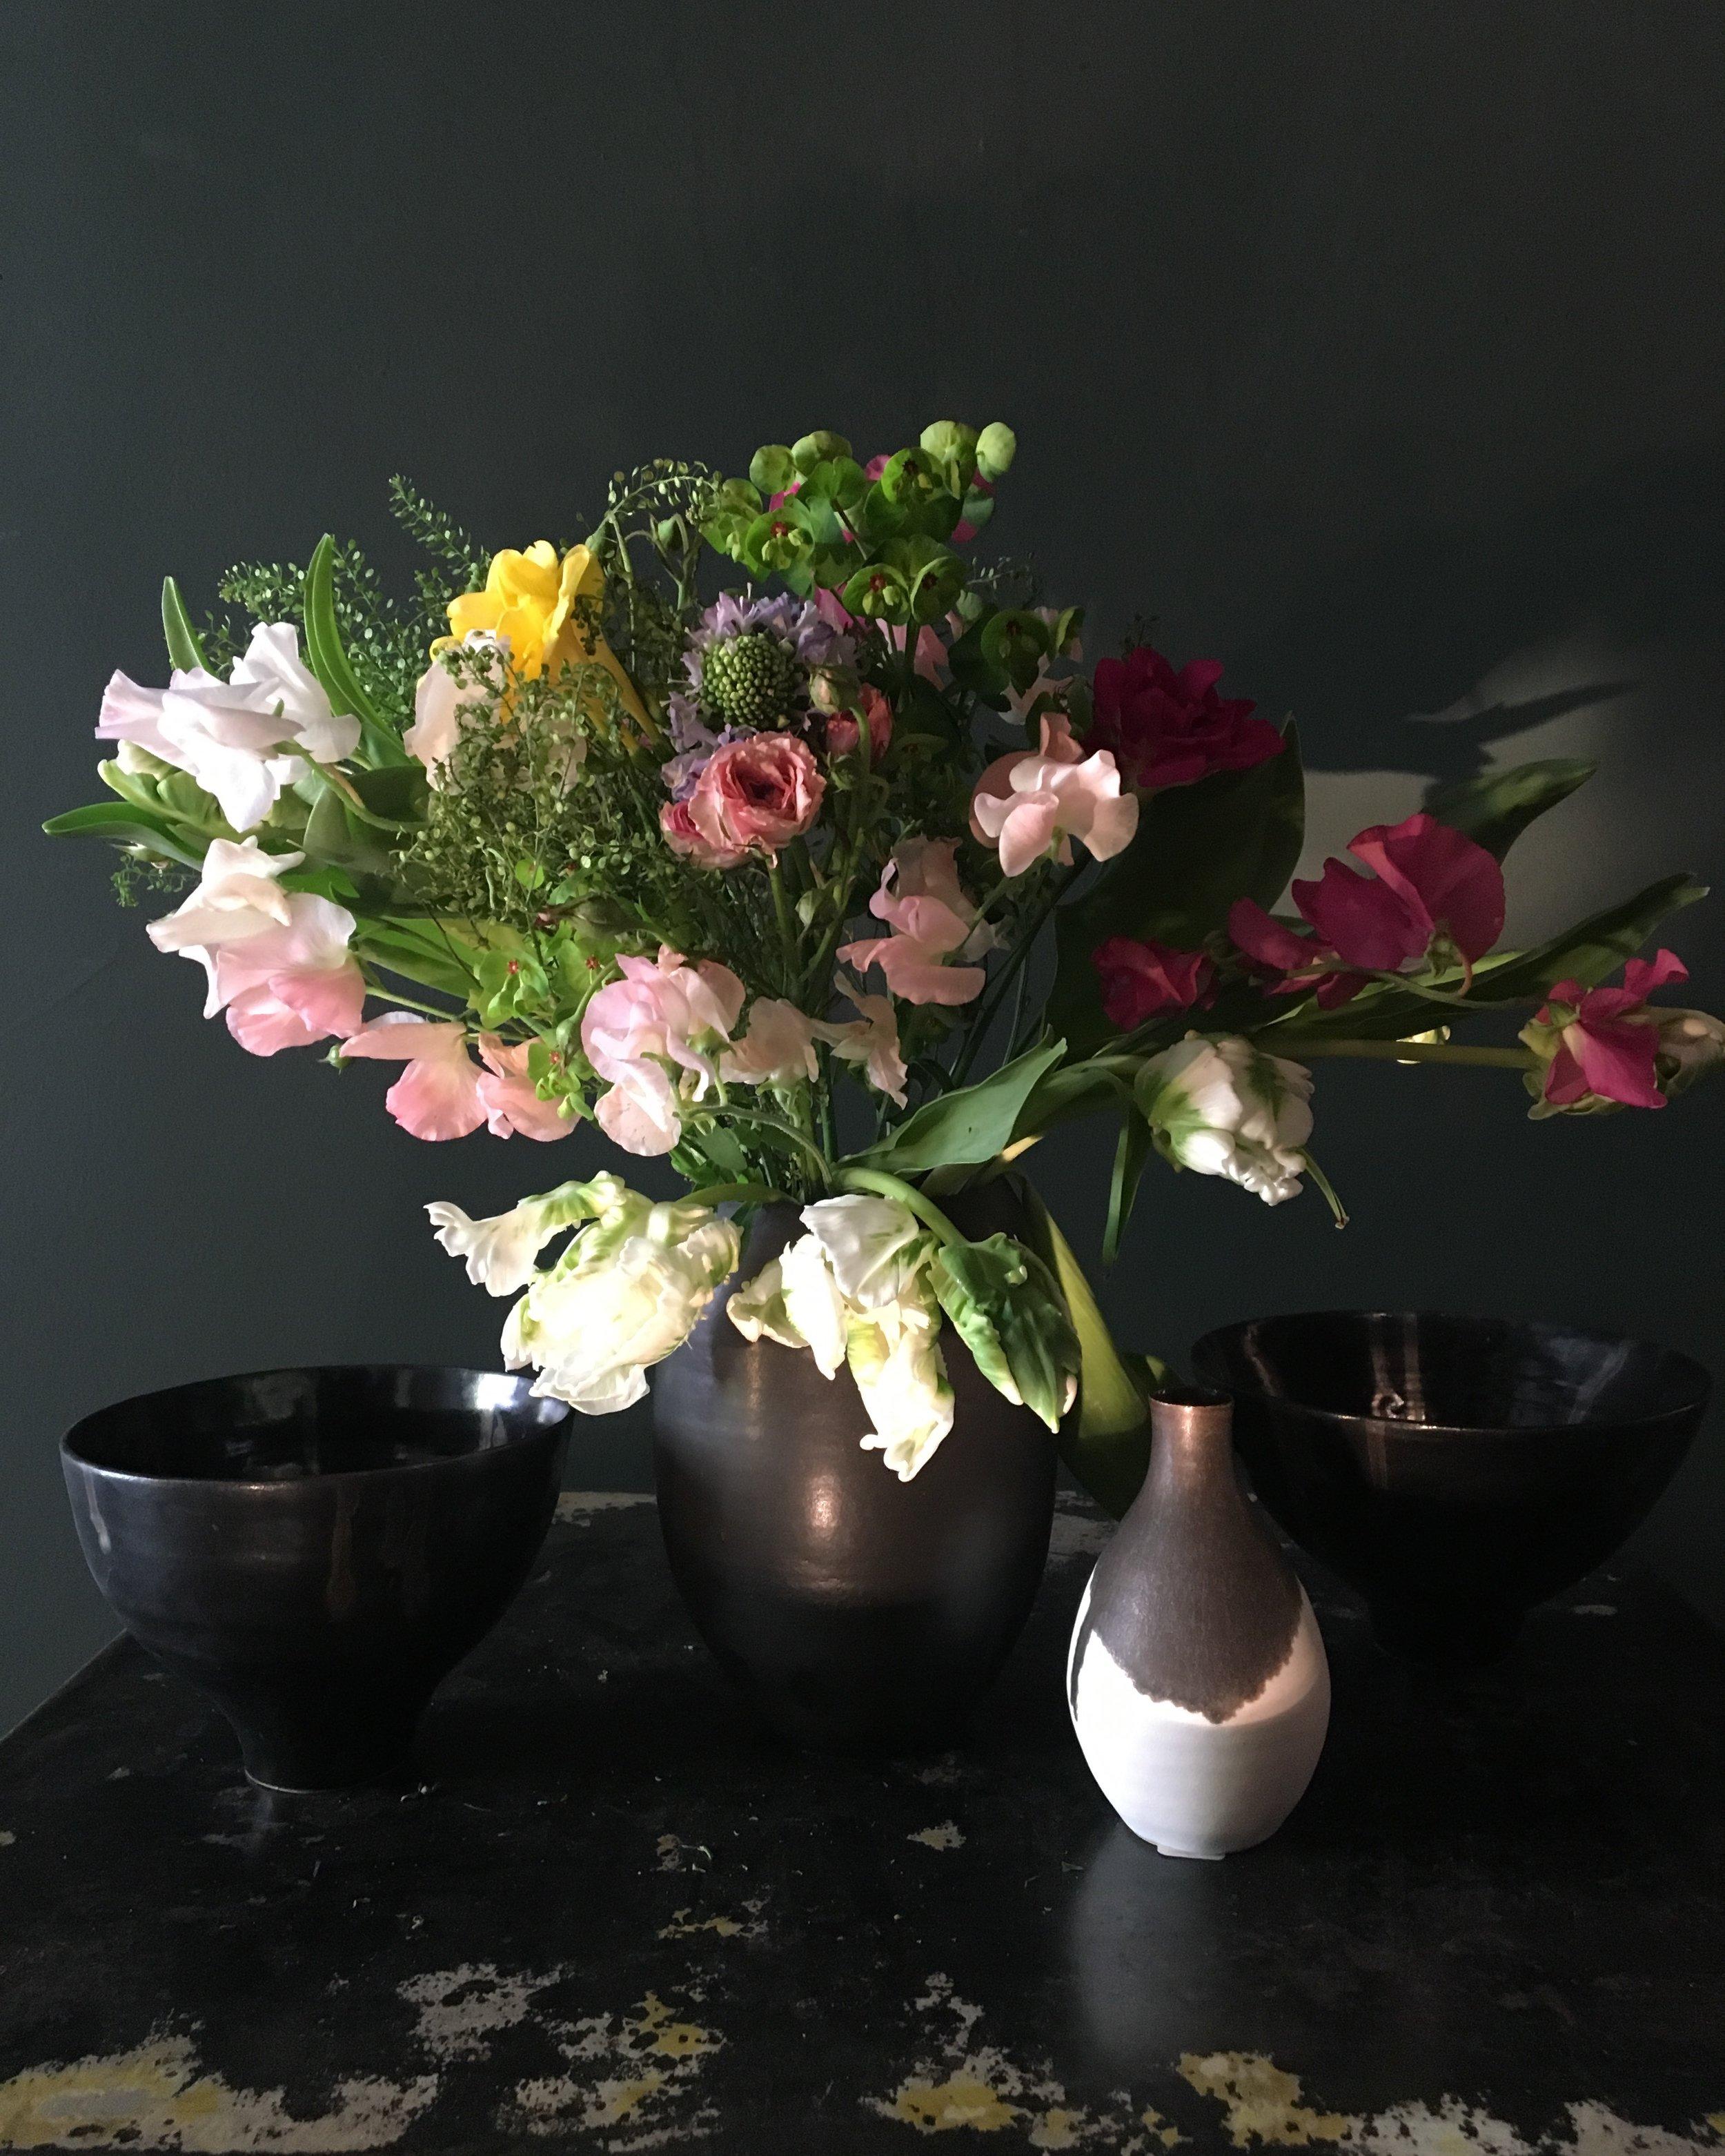 Bouquet by Horty Poetry, April 2019, Ceramic by Valerie Valençon